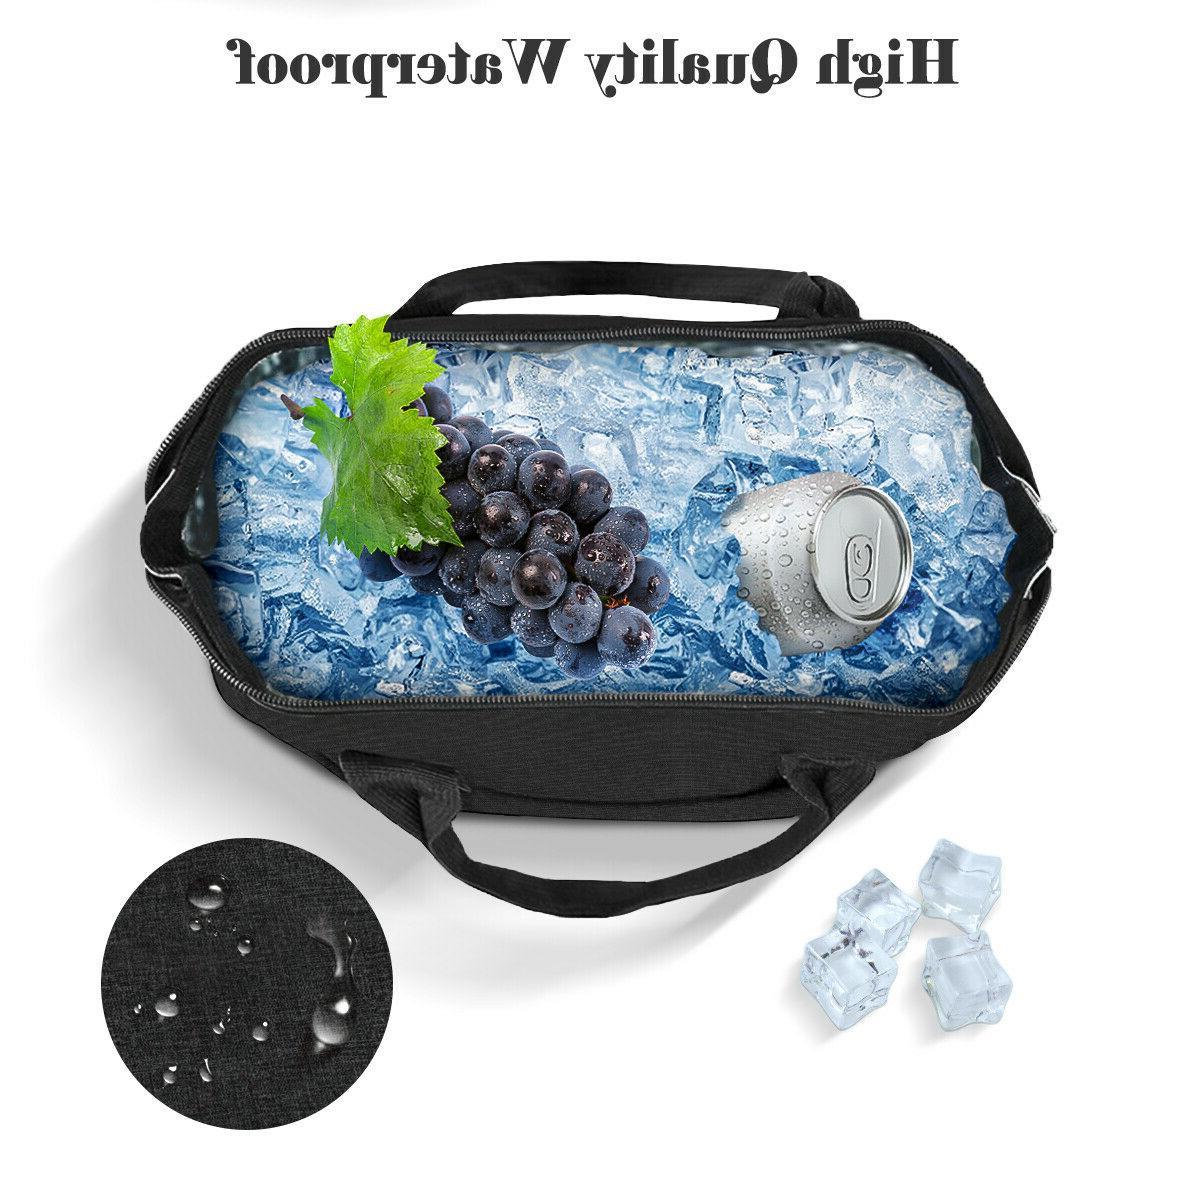 Cationic Lunch Waterproof Bag Men Women Tote